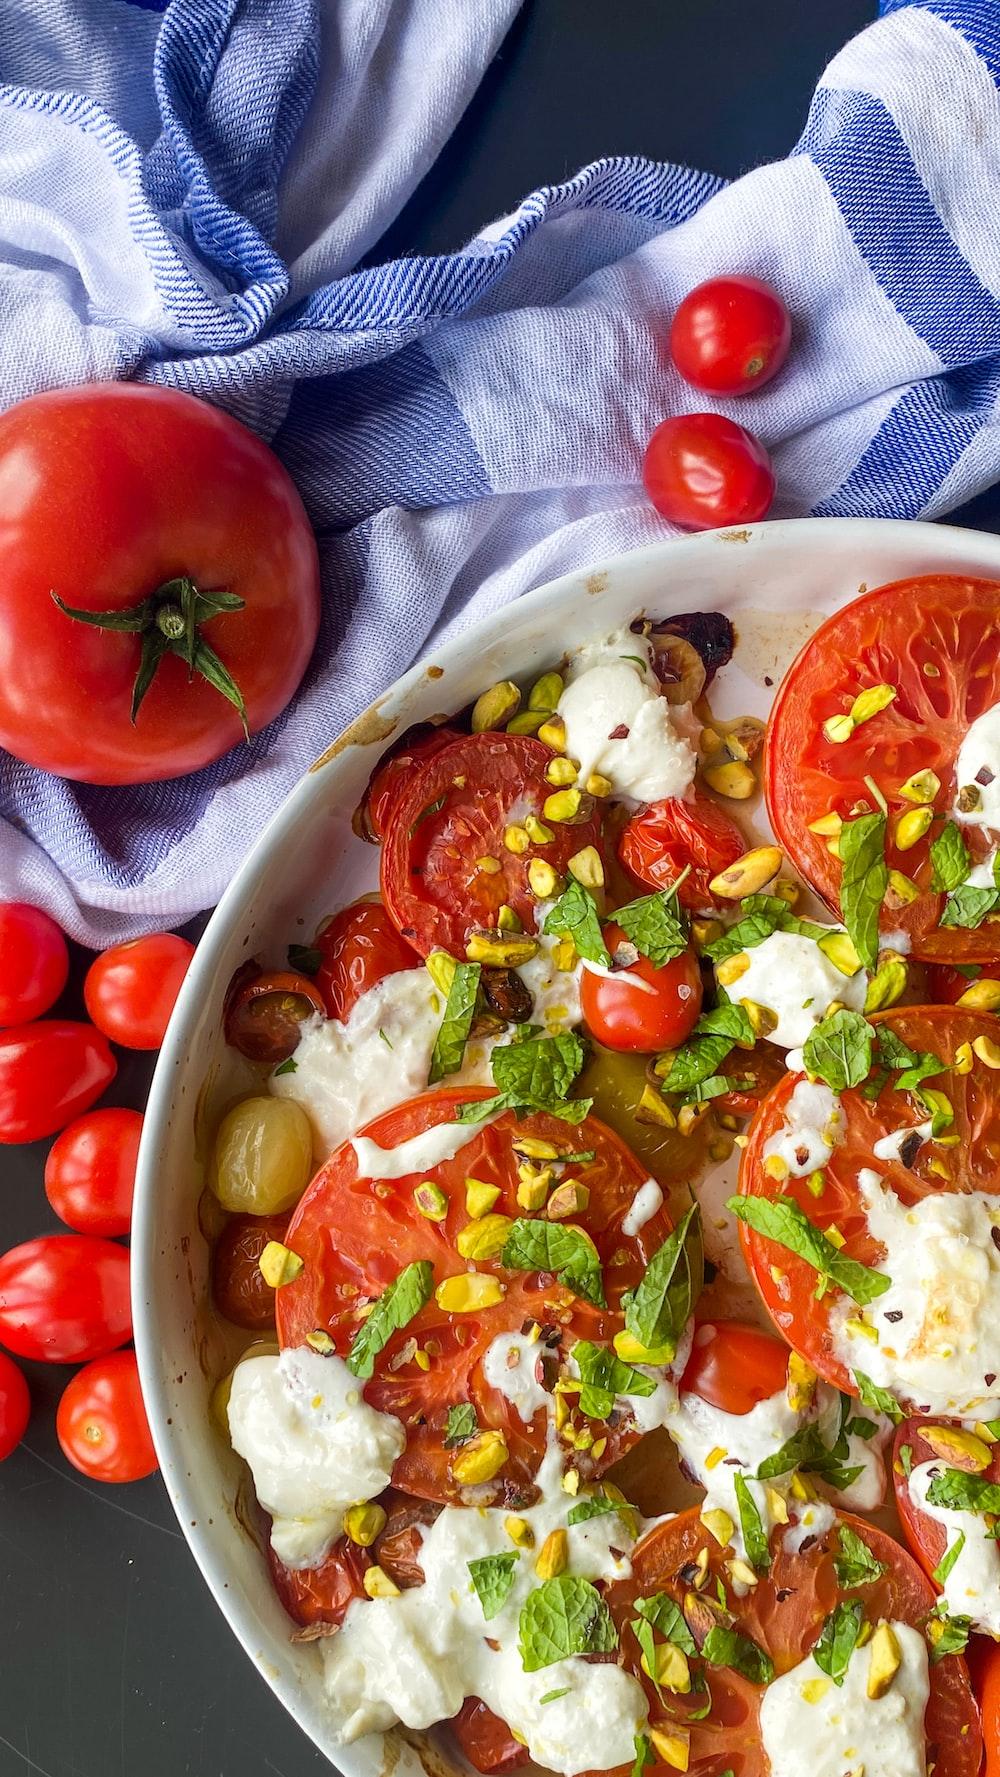 tomato and green vegetable salad on white ceramic bowl